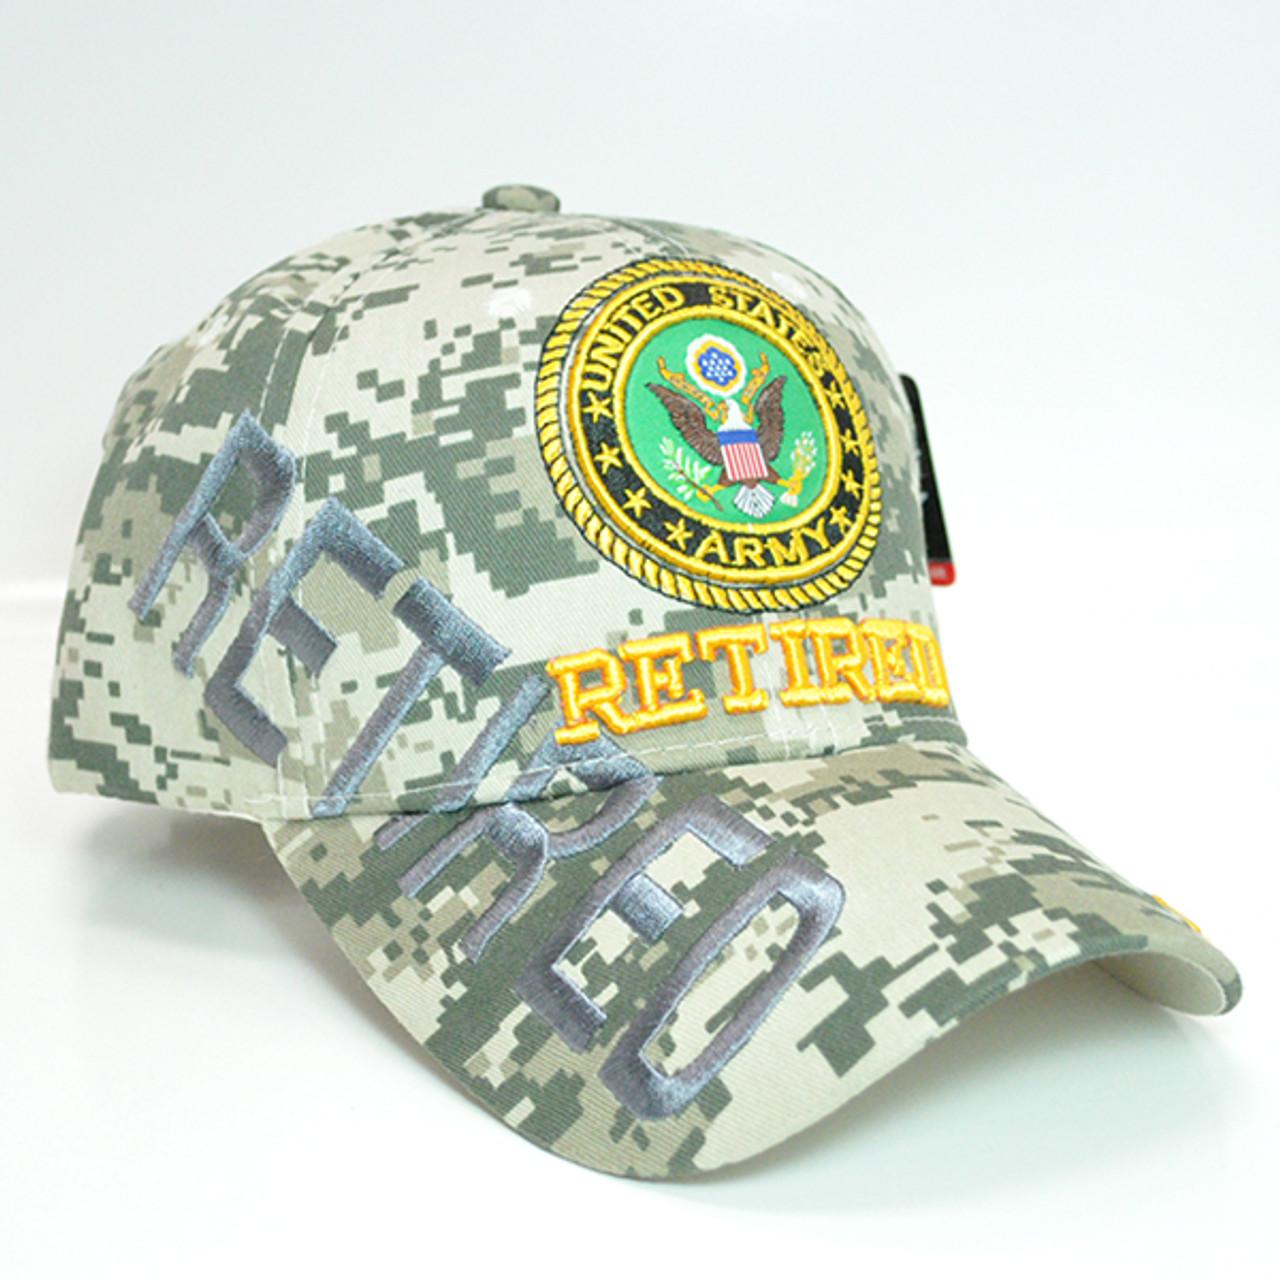 ARMY hat Military ARMY logo Baseball cap Official Licensed-ACU Digital camo U.S